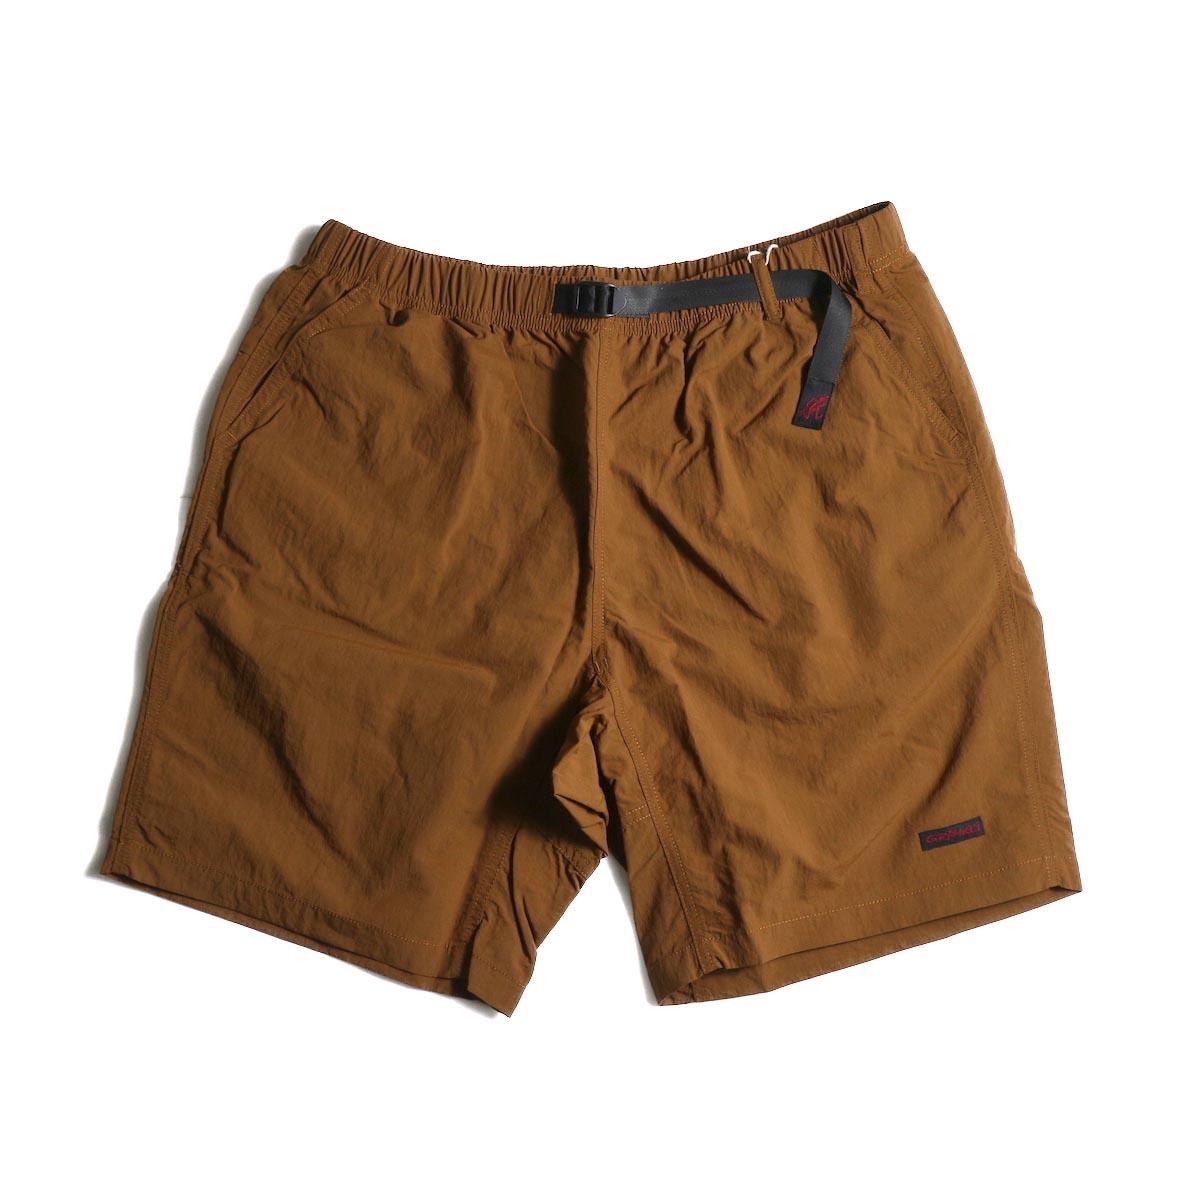 GRAMICCI / Shell Packable Shorts (Mocha)正面